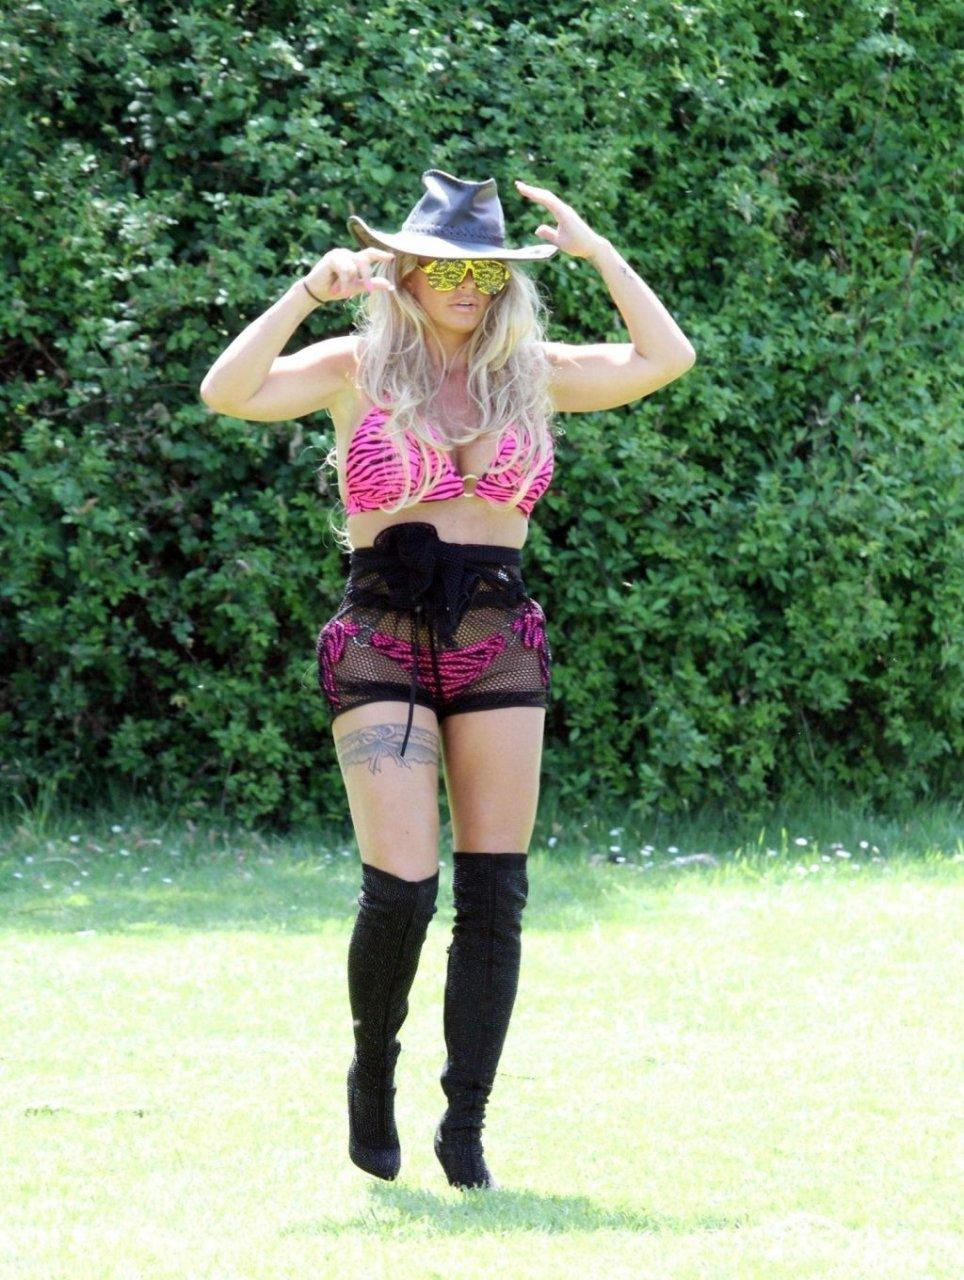 Katie Price Sexy (76 Photos)